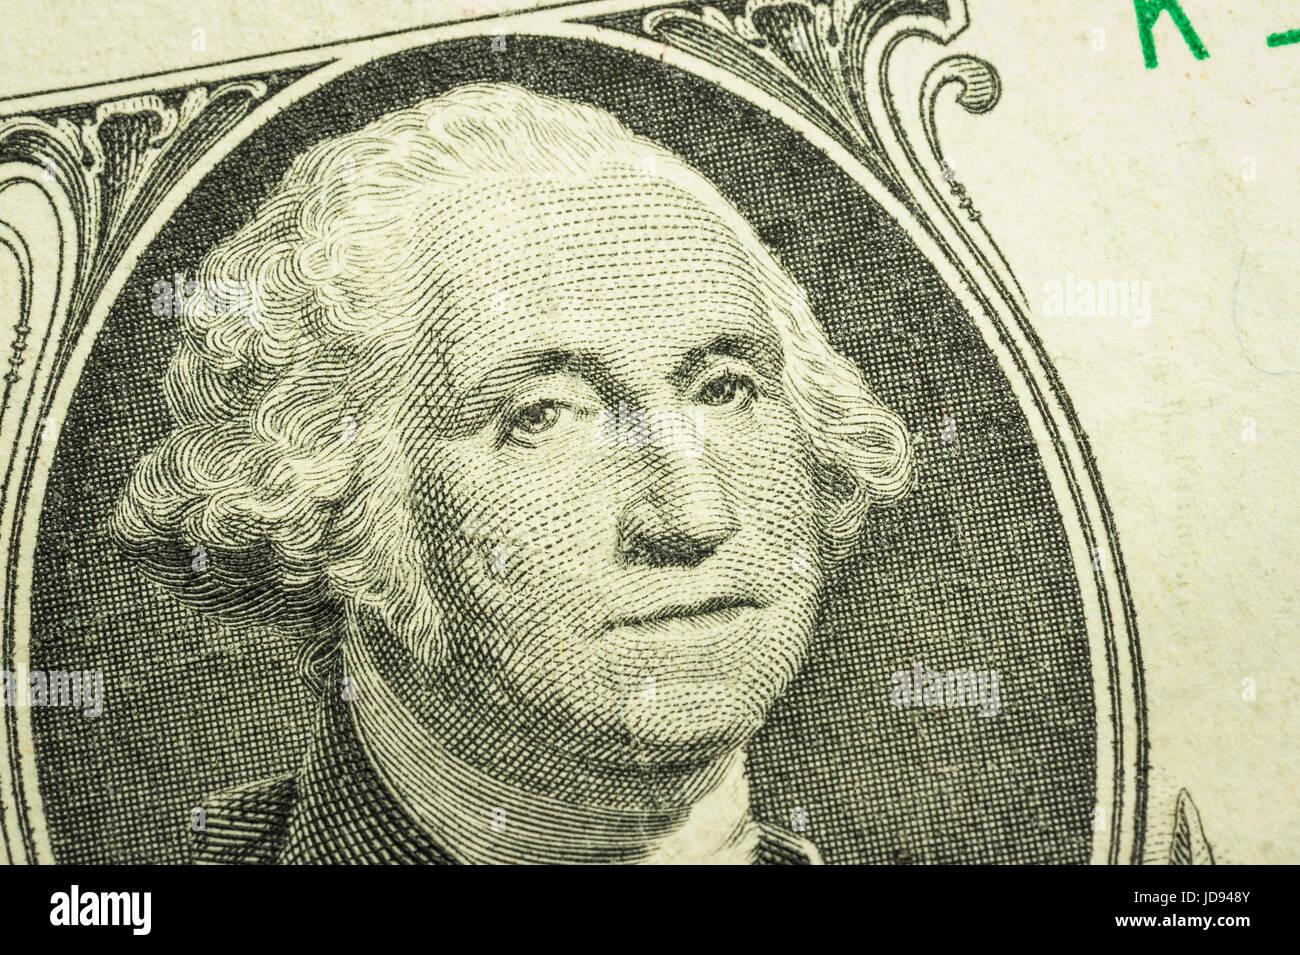 George Washington Detail One US Dollar Bill - Stock Image